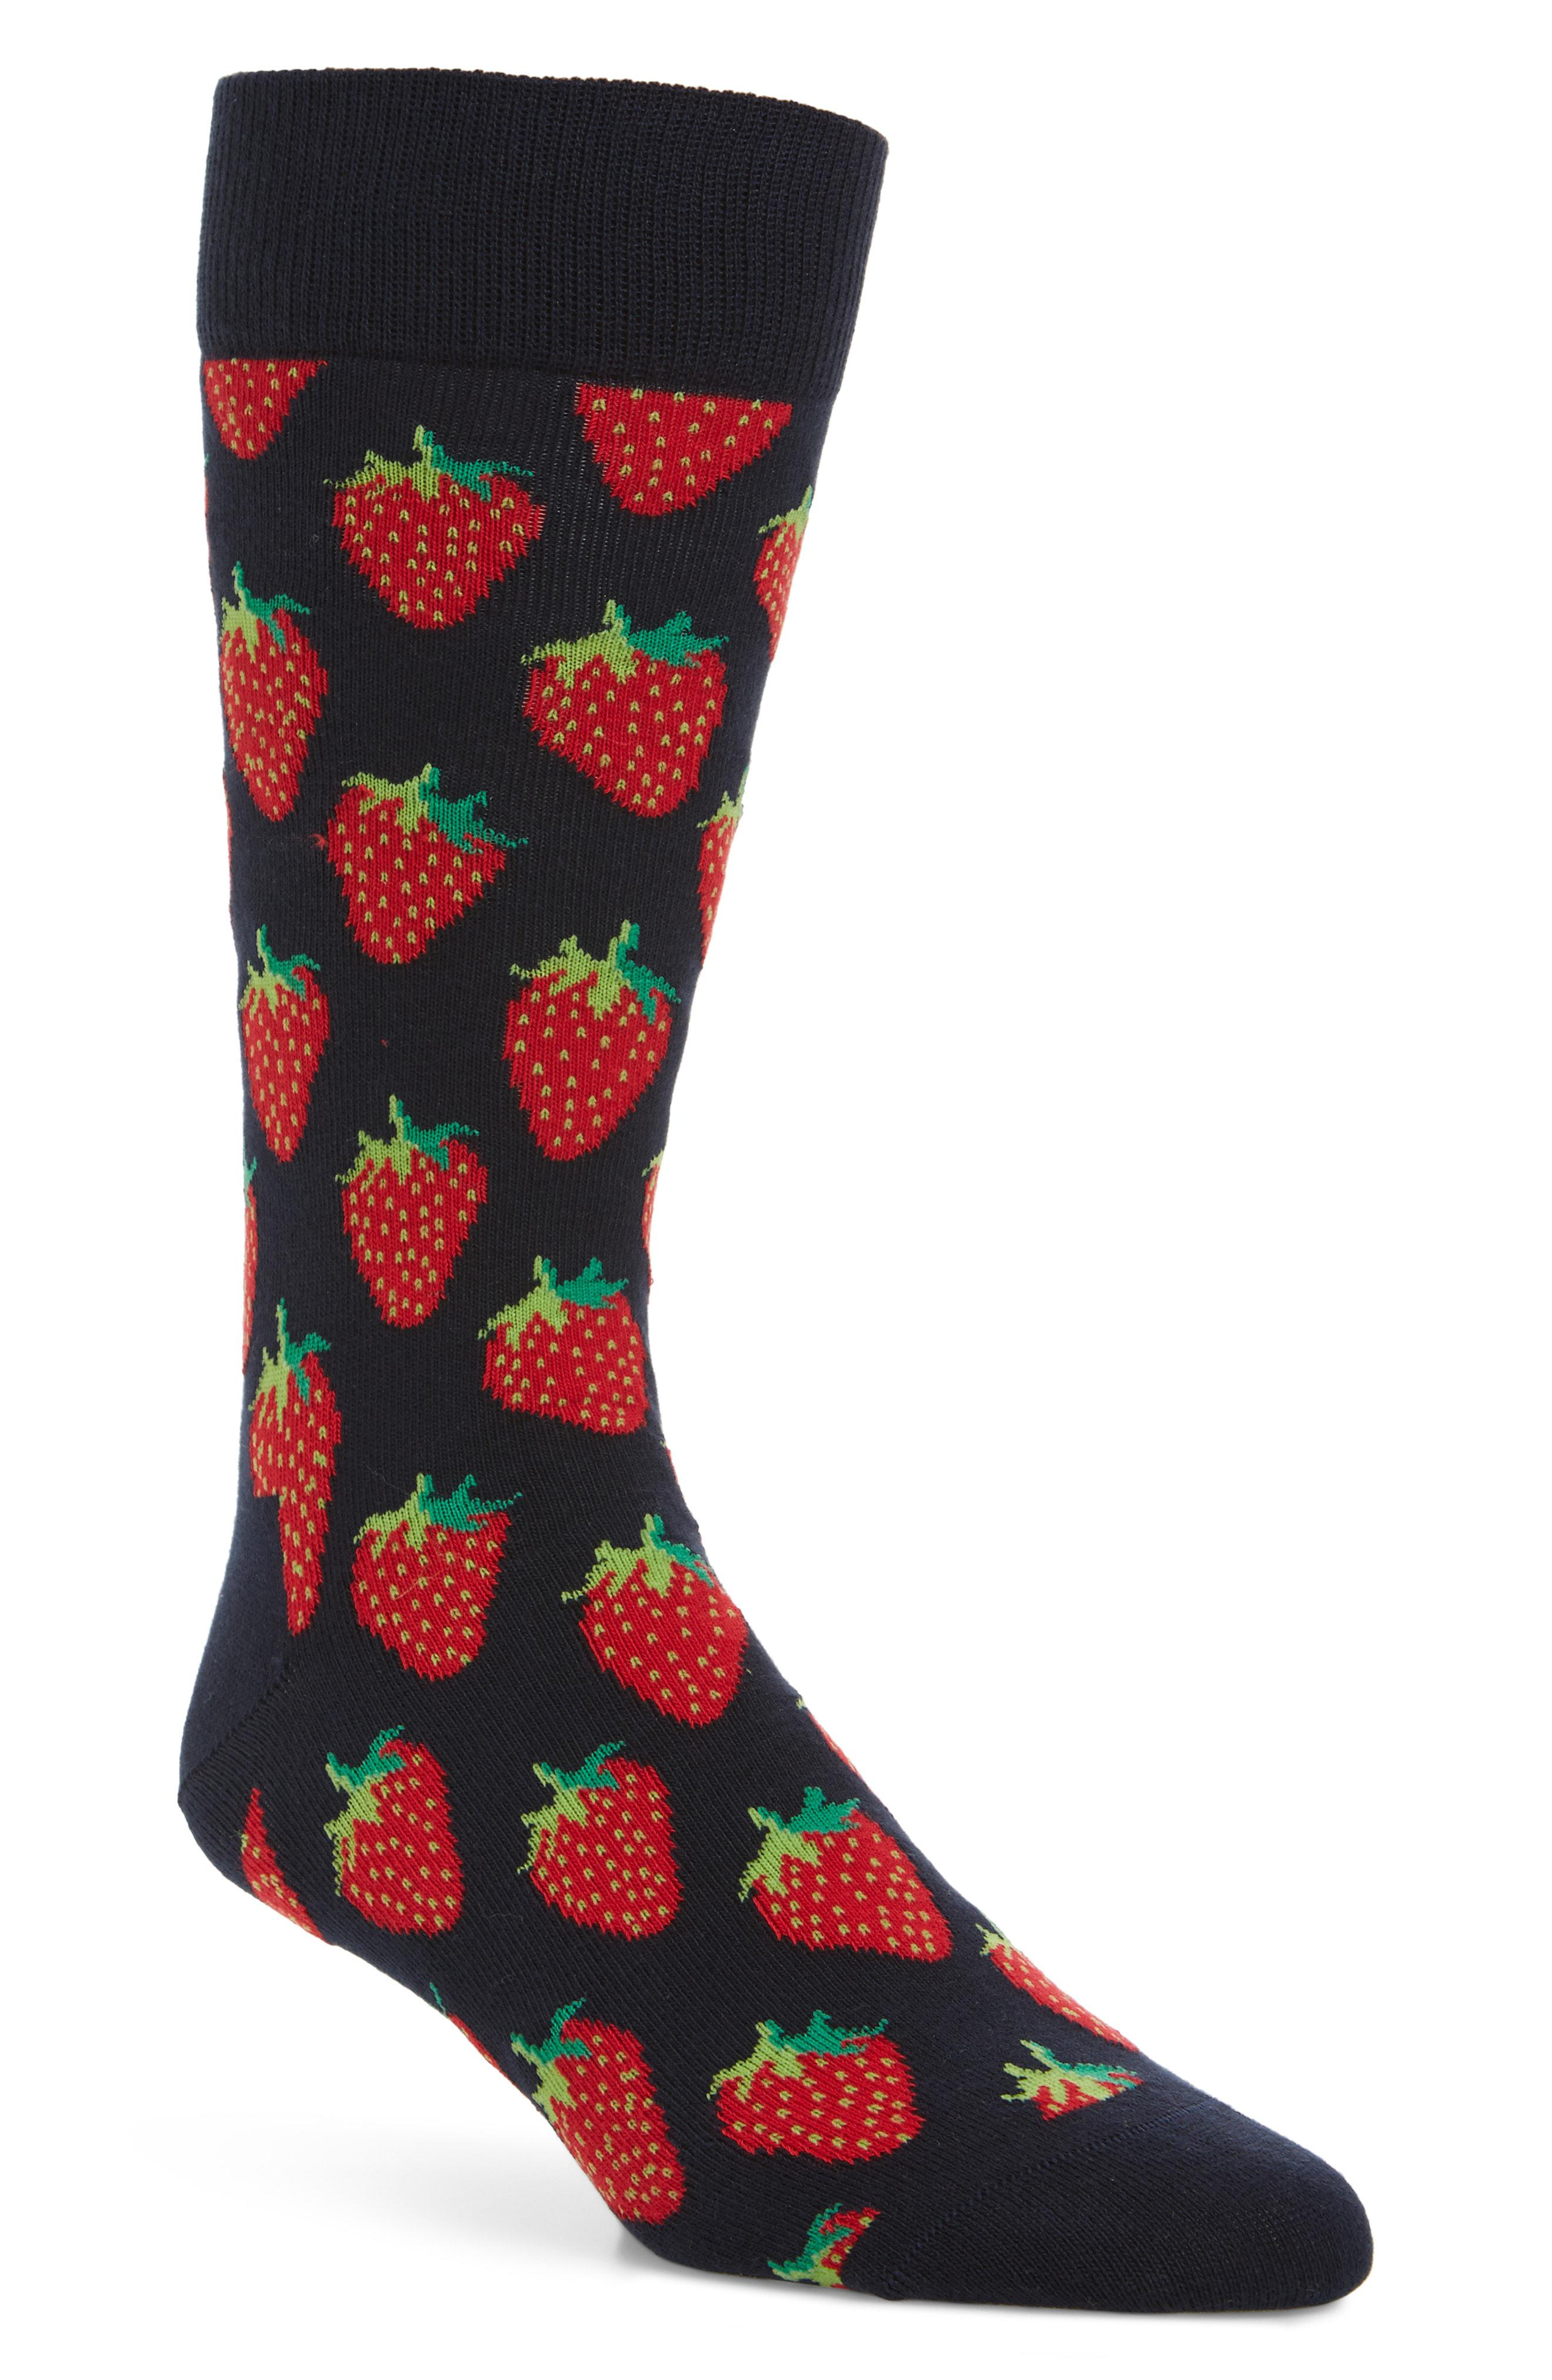 Lyst - Happy Socks Strawberry Socks in Blue for Men